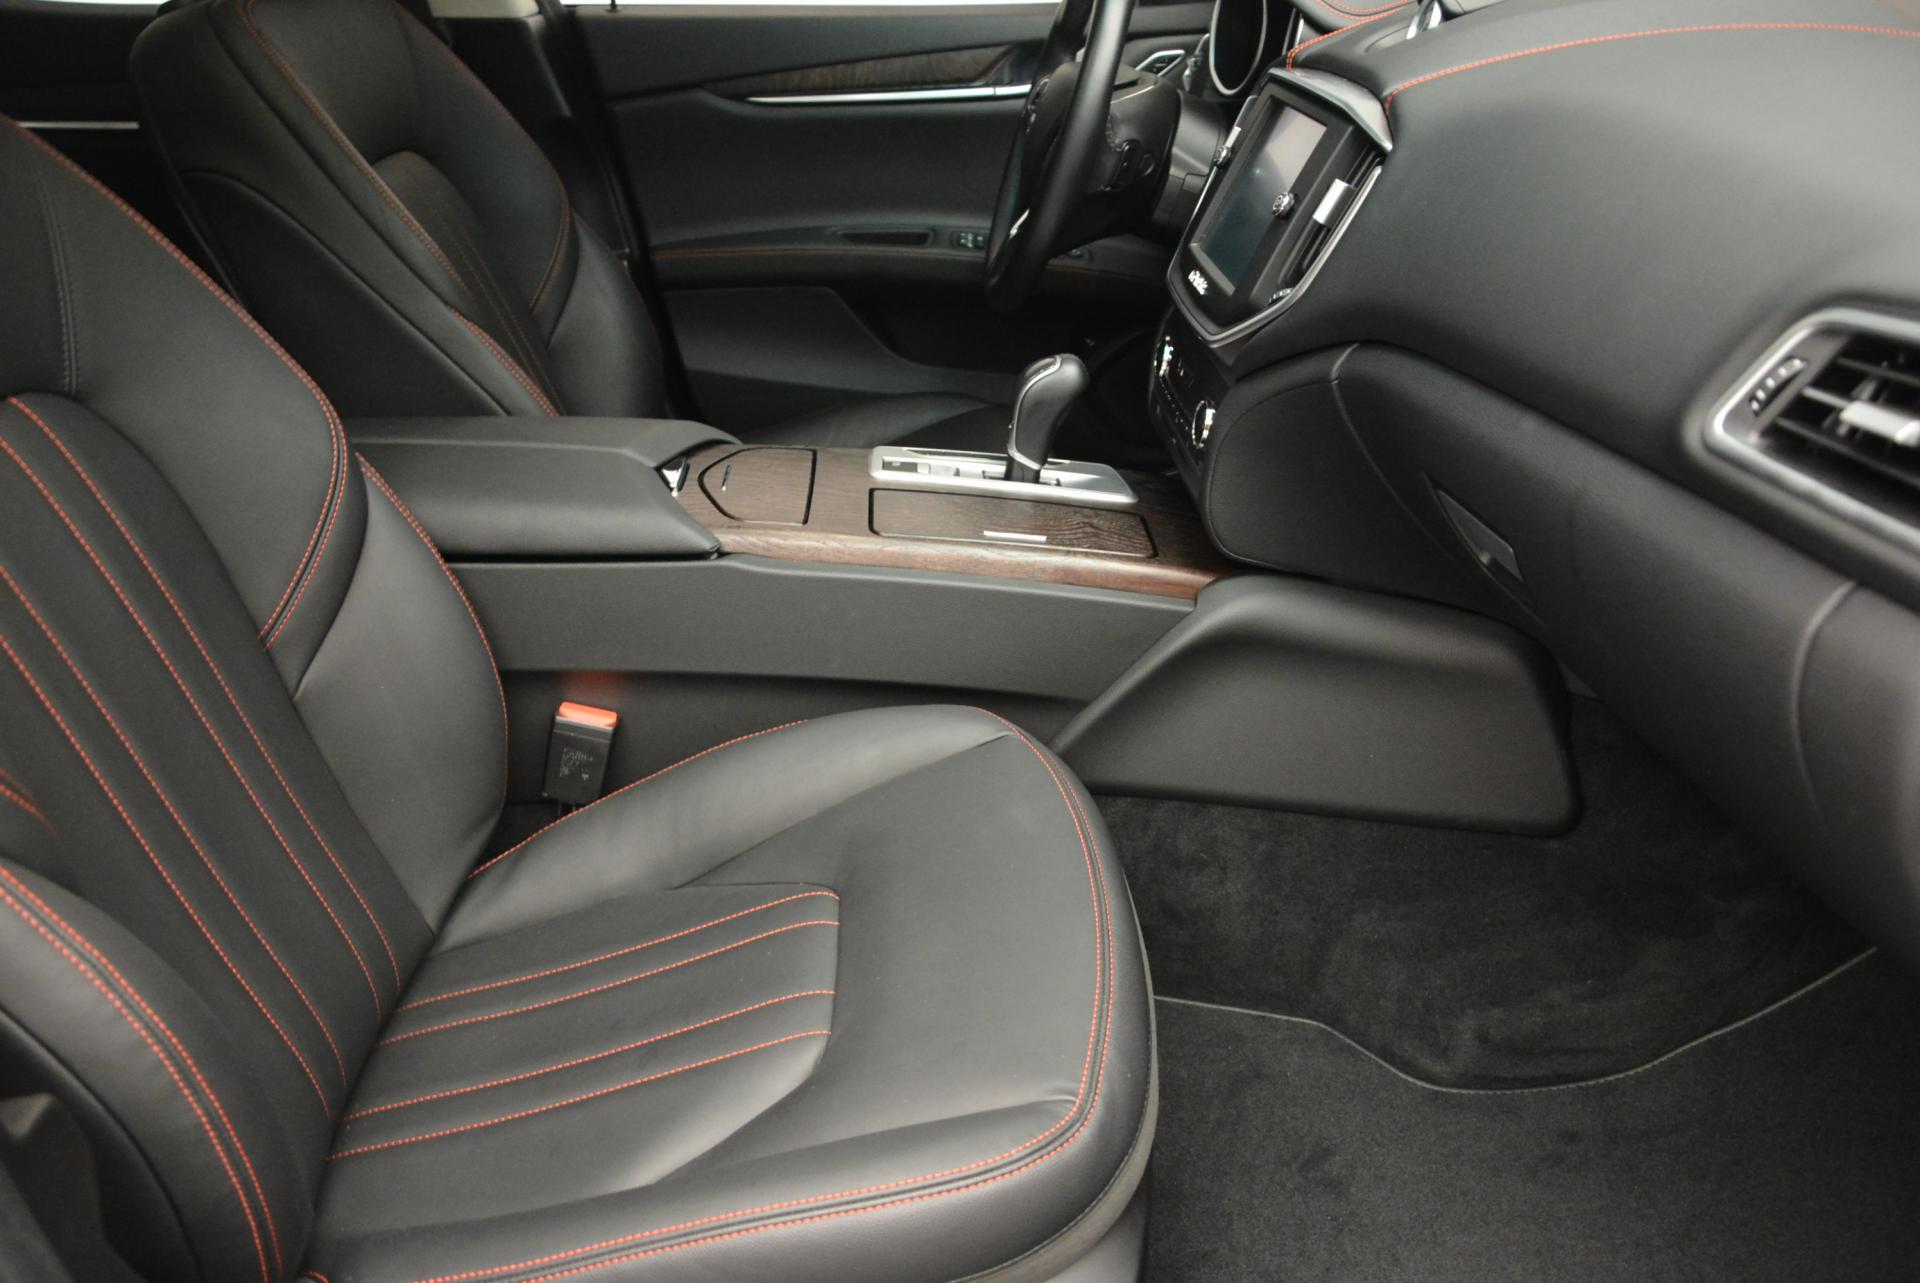 Used 2016 Maserati Ghibli S Q4 For Sale In Greenwich, CT 192_p14